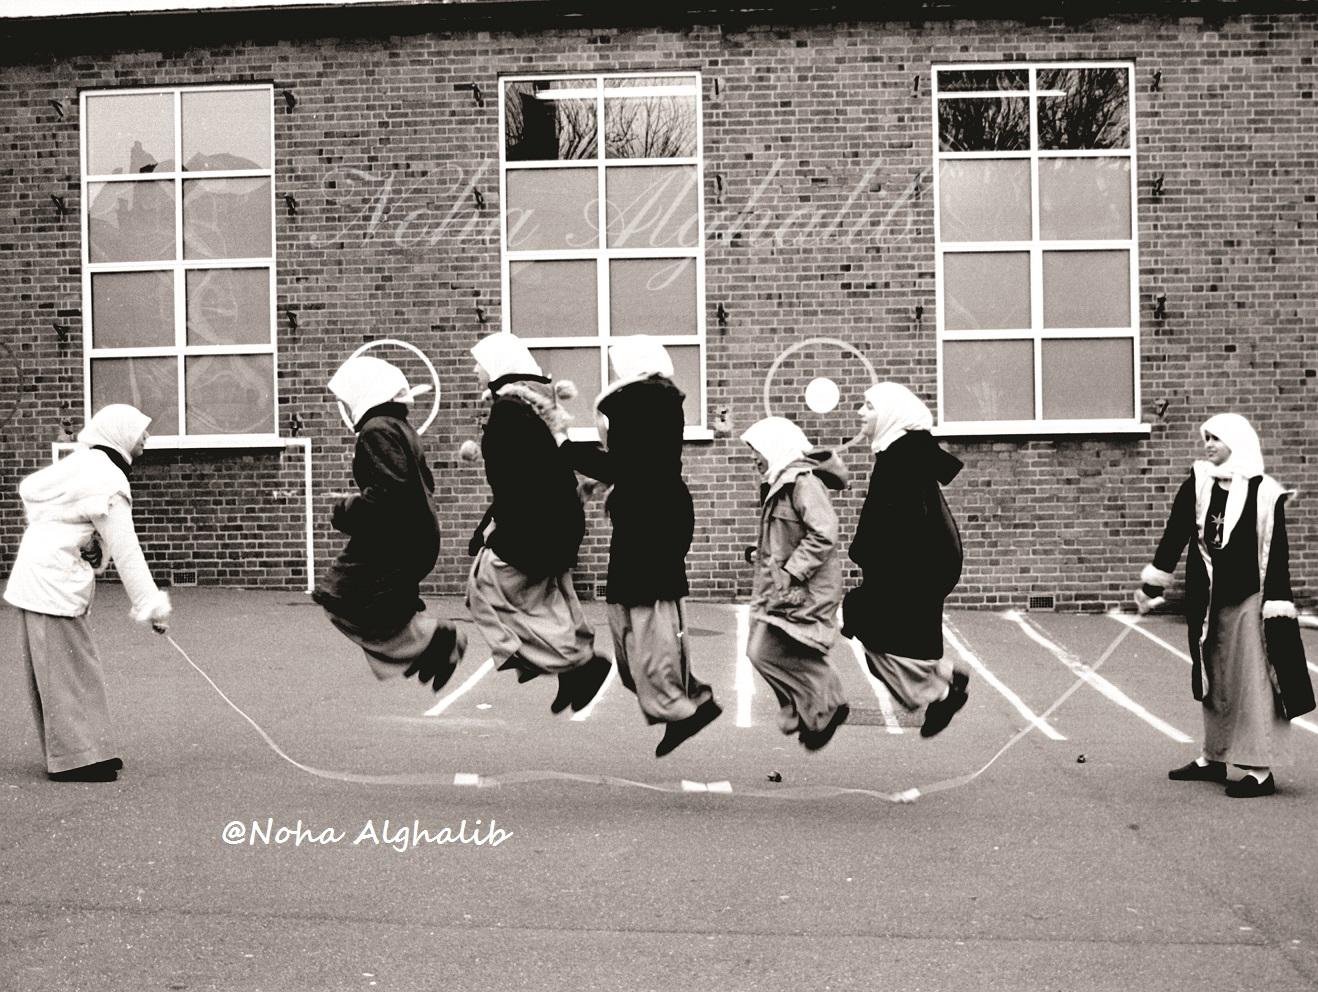 Islamic School at London,UK